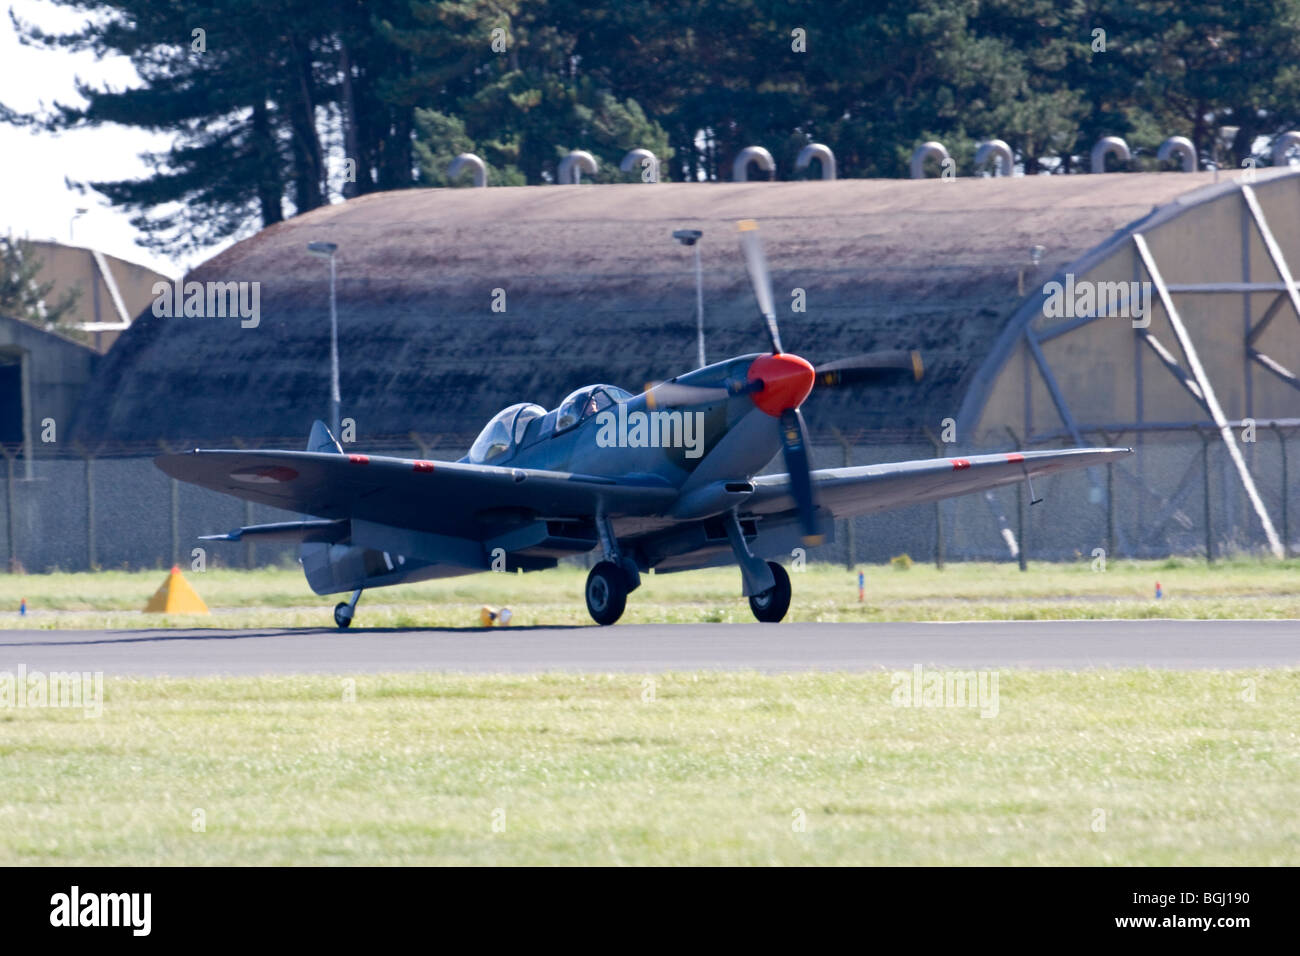 IAC161- Spitfire Tr.9 at RAF Leuchars Airshow 2009, Fife, Scotland - Stock Image